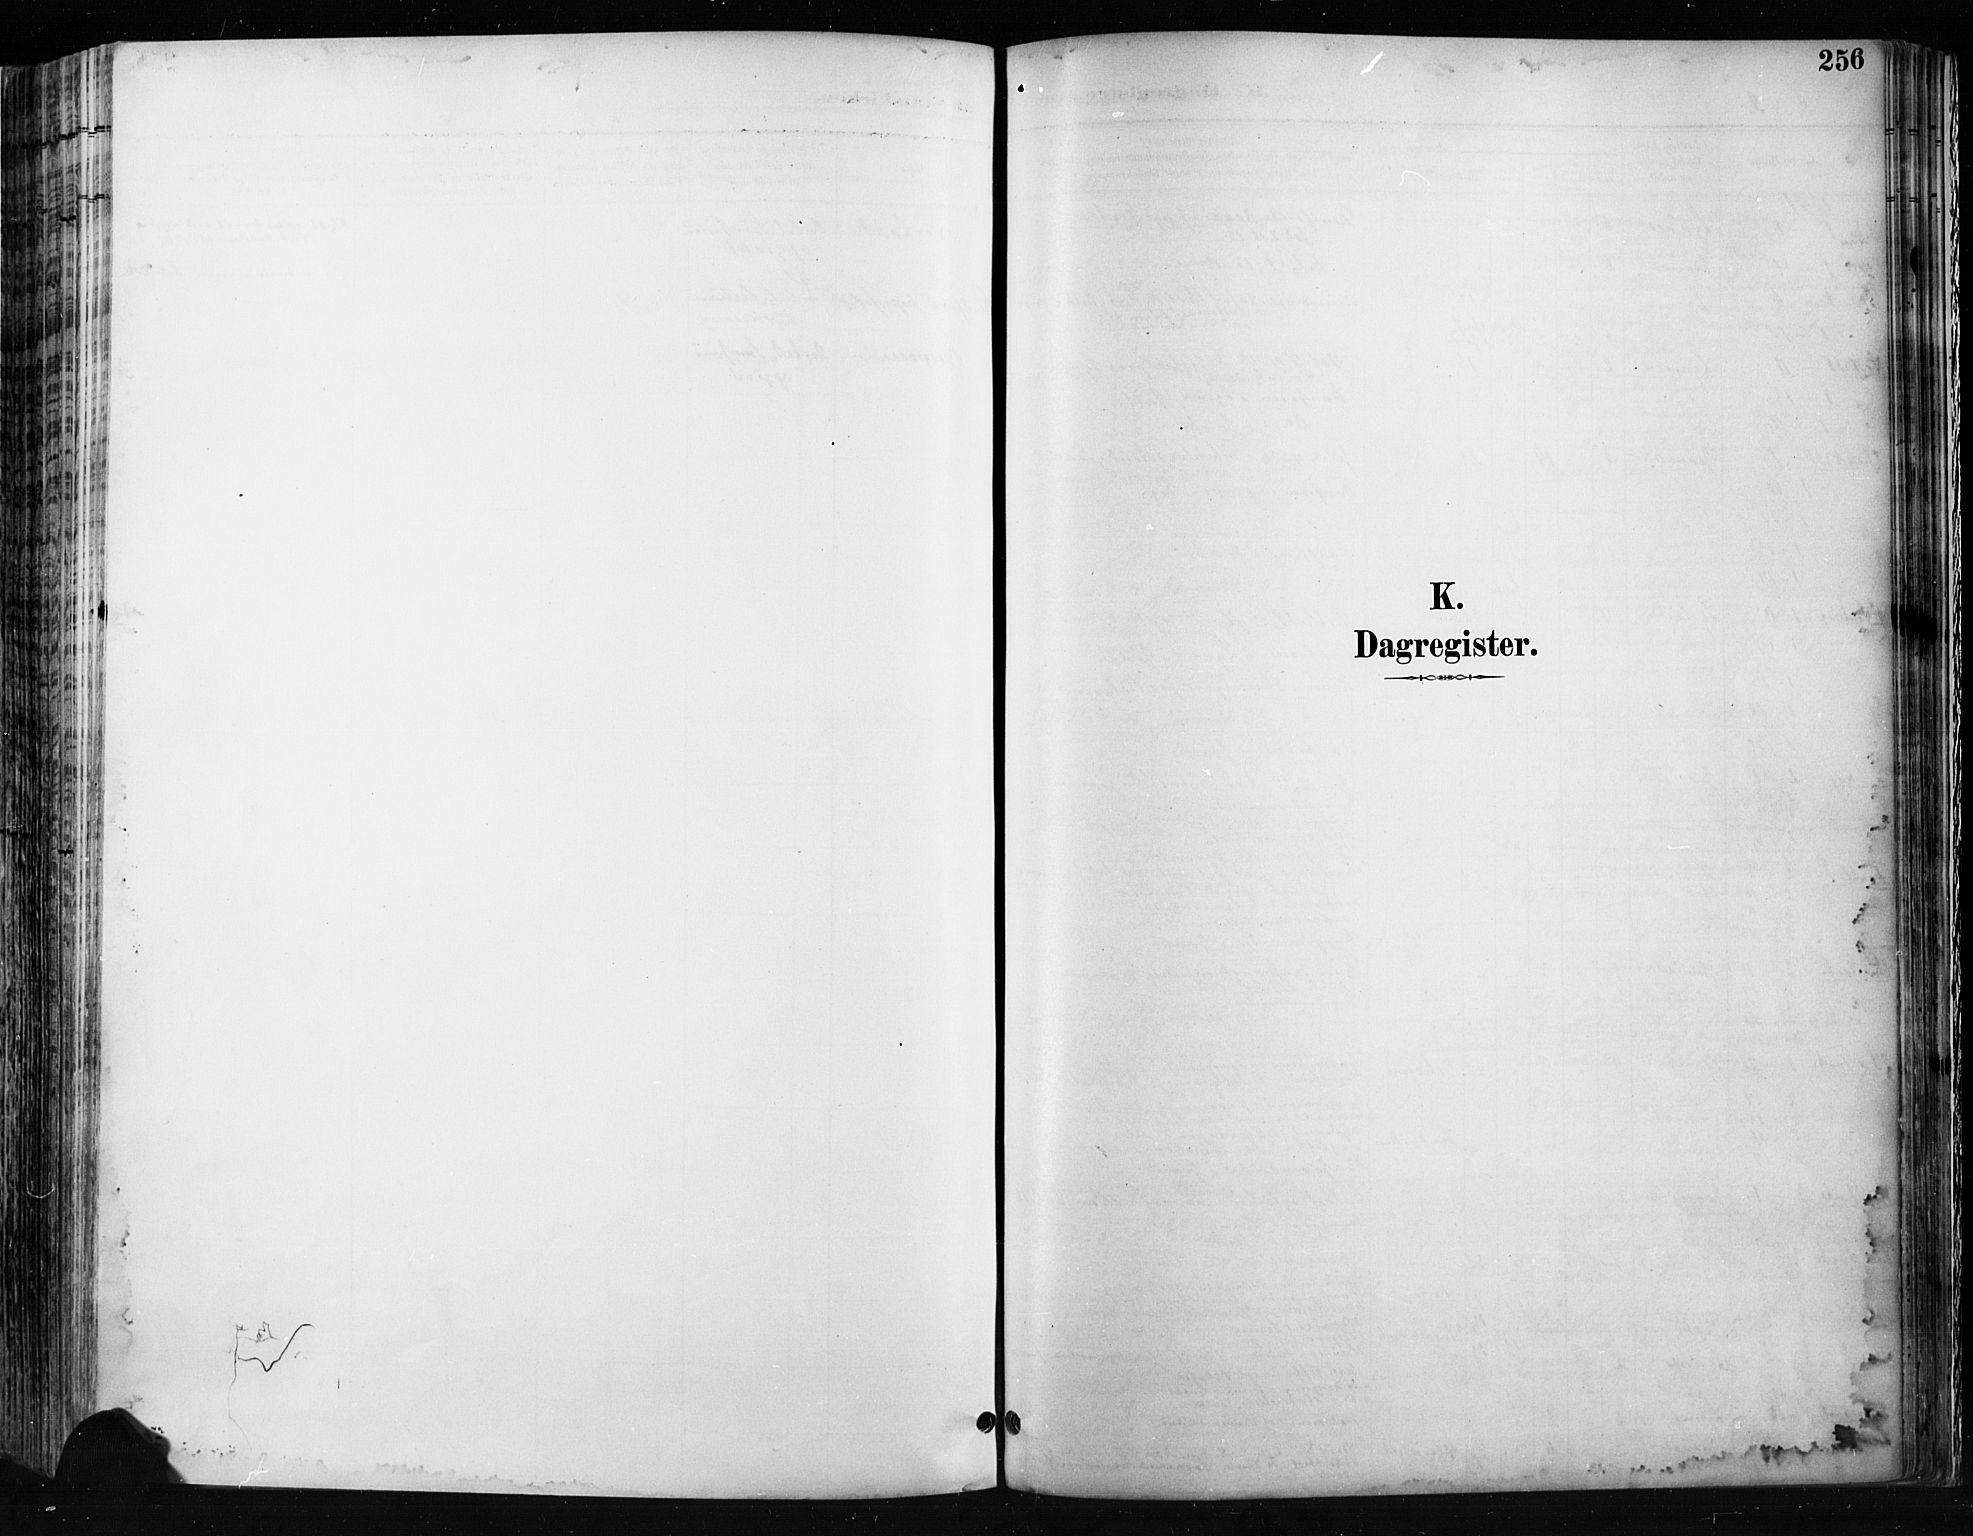 SAH, Jevnaker prestekontor, Ministerialbok nr. 9, 1891-1901, s. 256